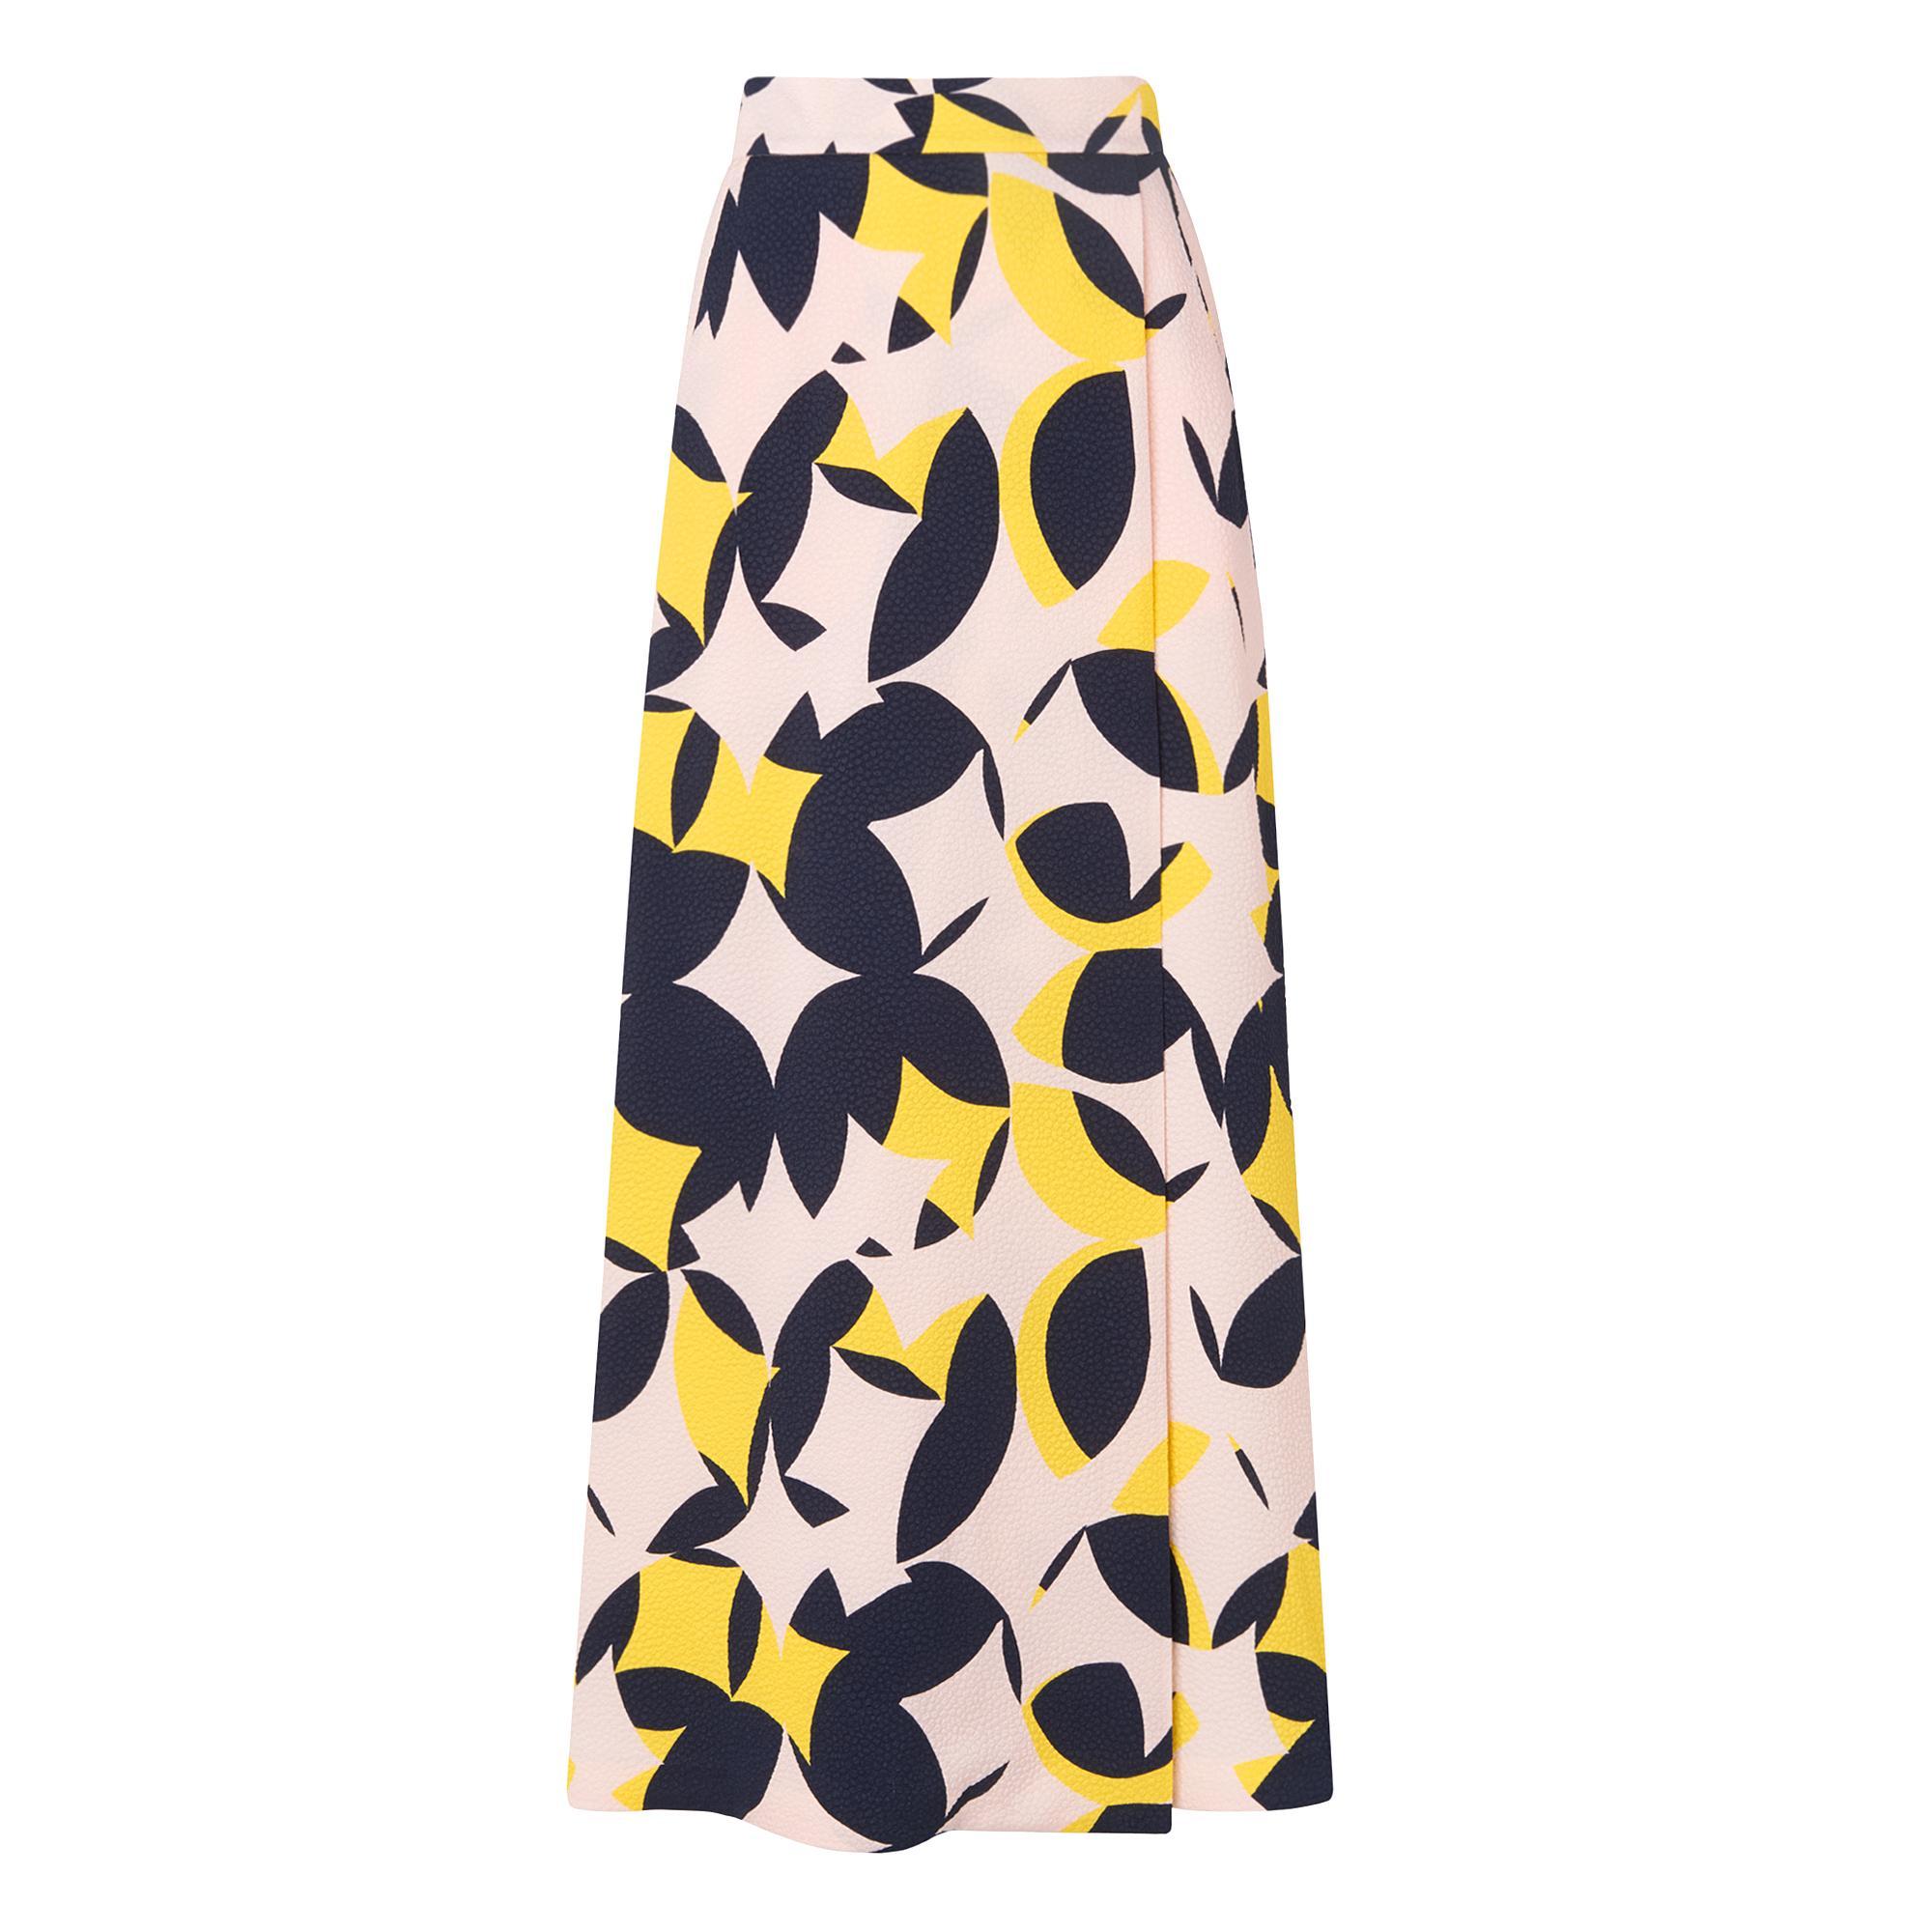 L.K.Bennett Lina Geometric Print Skirt